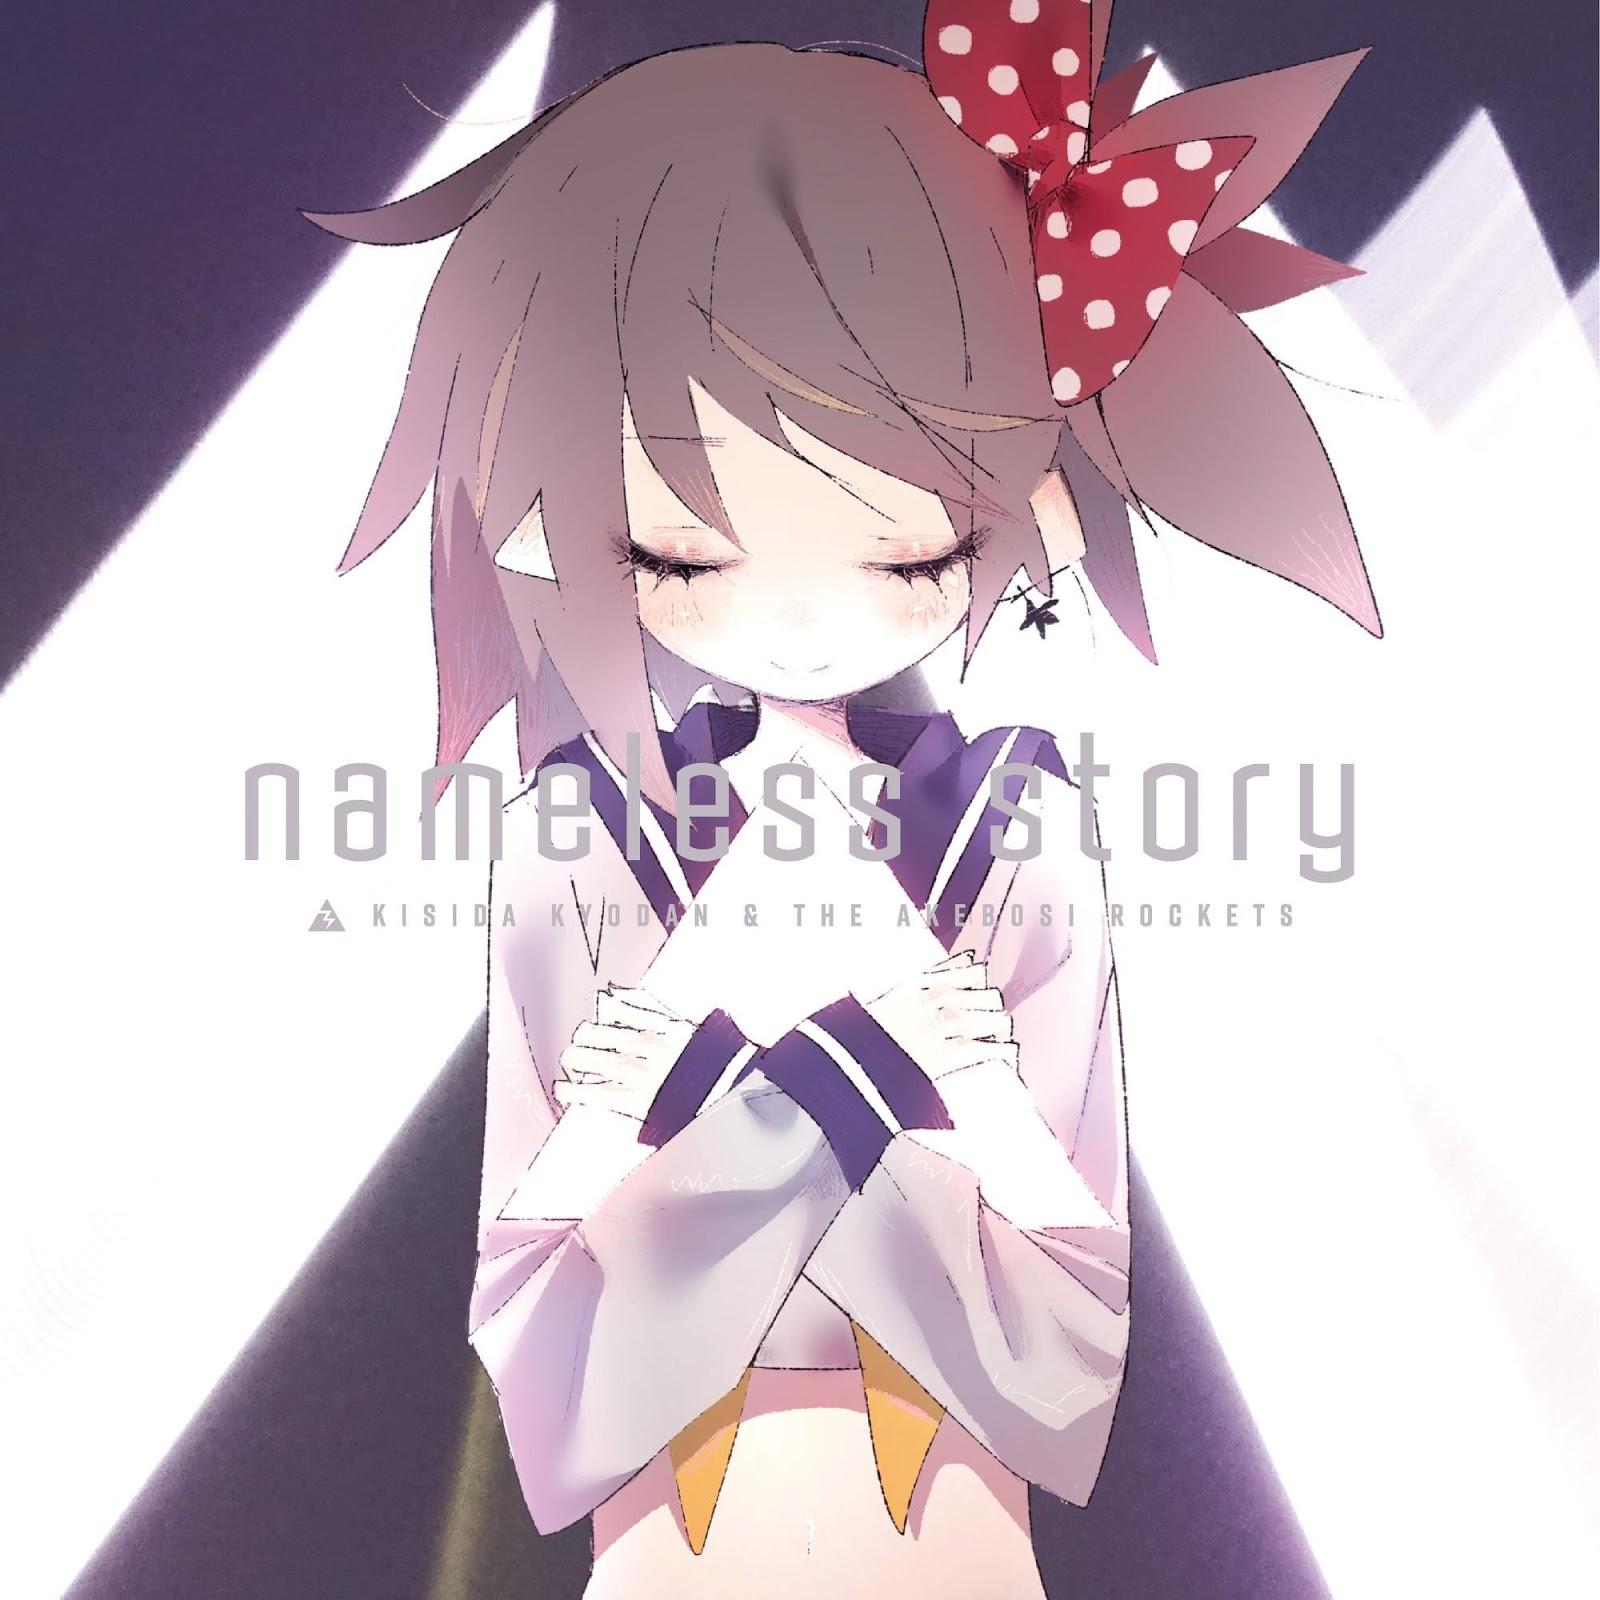 [ED] nameless story – Kishida Kyoudan &THE Akeboshi Rockets